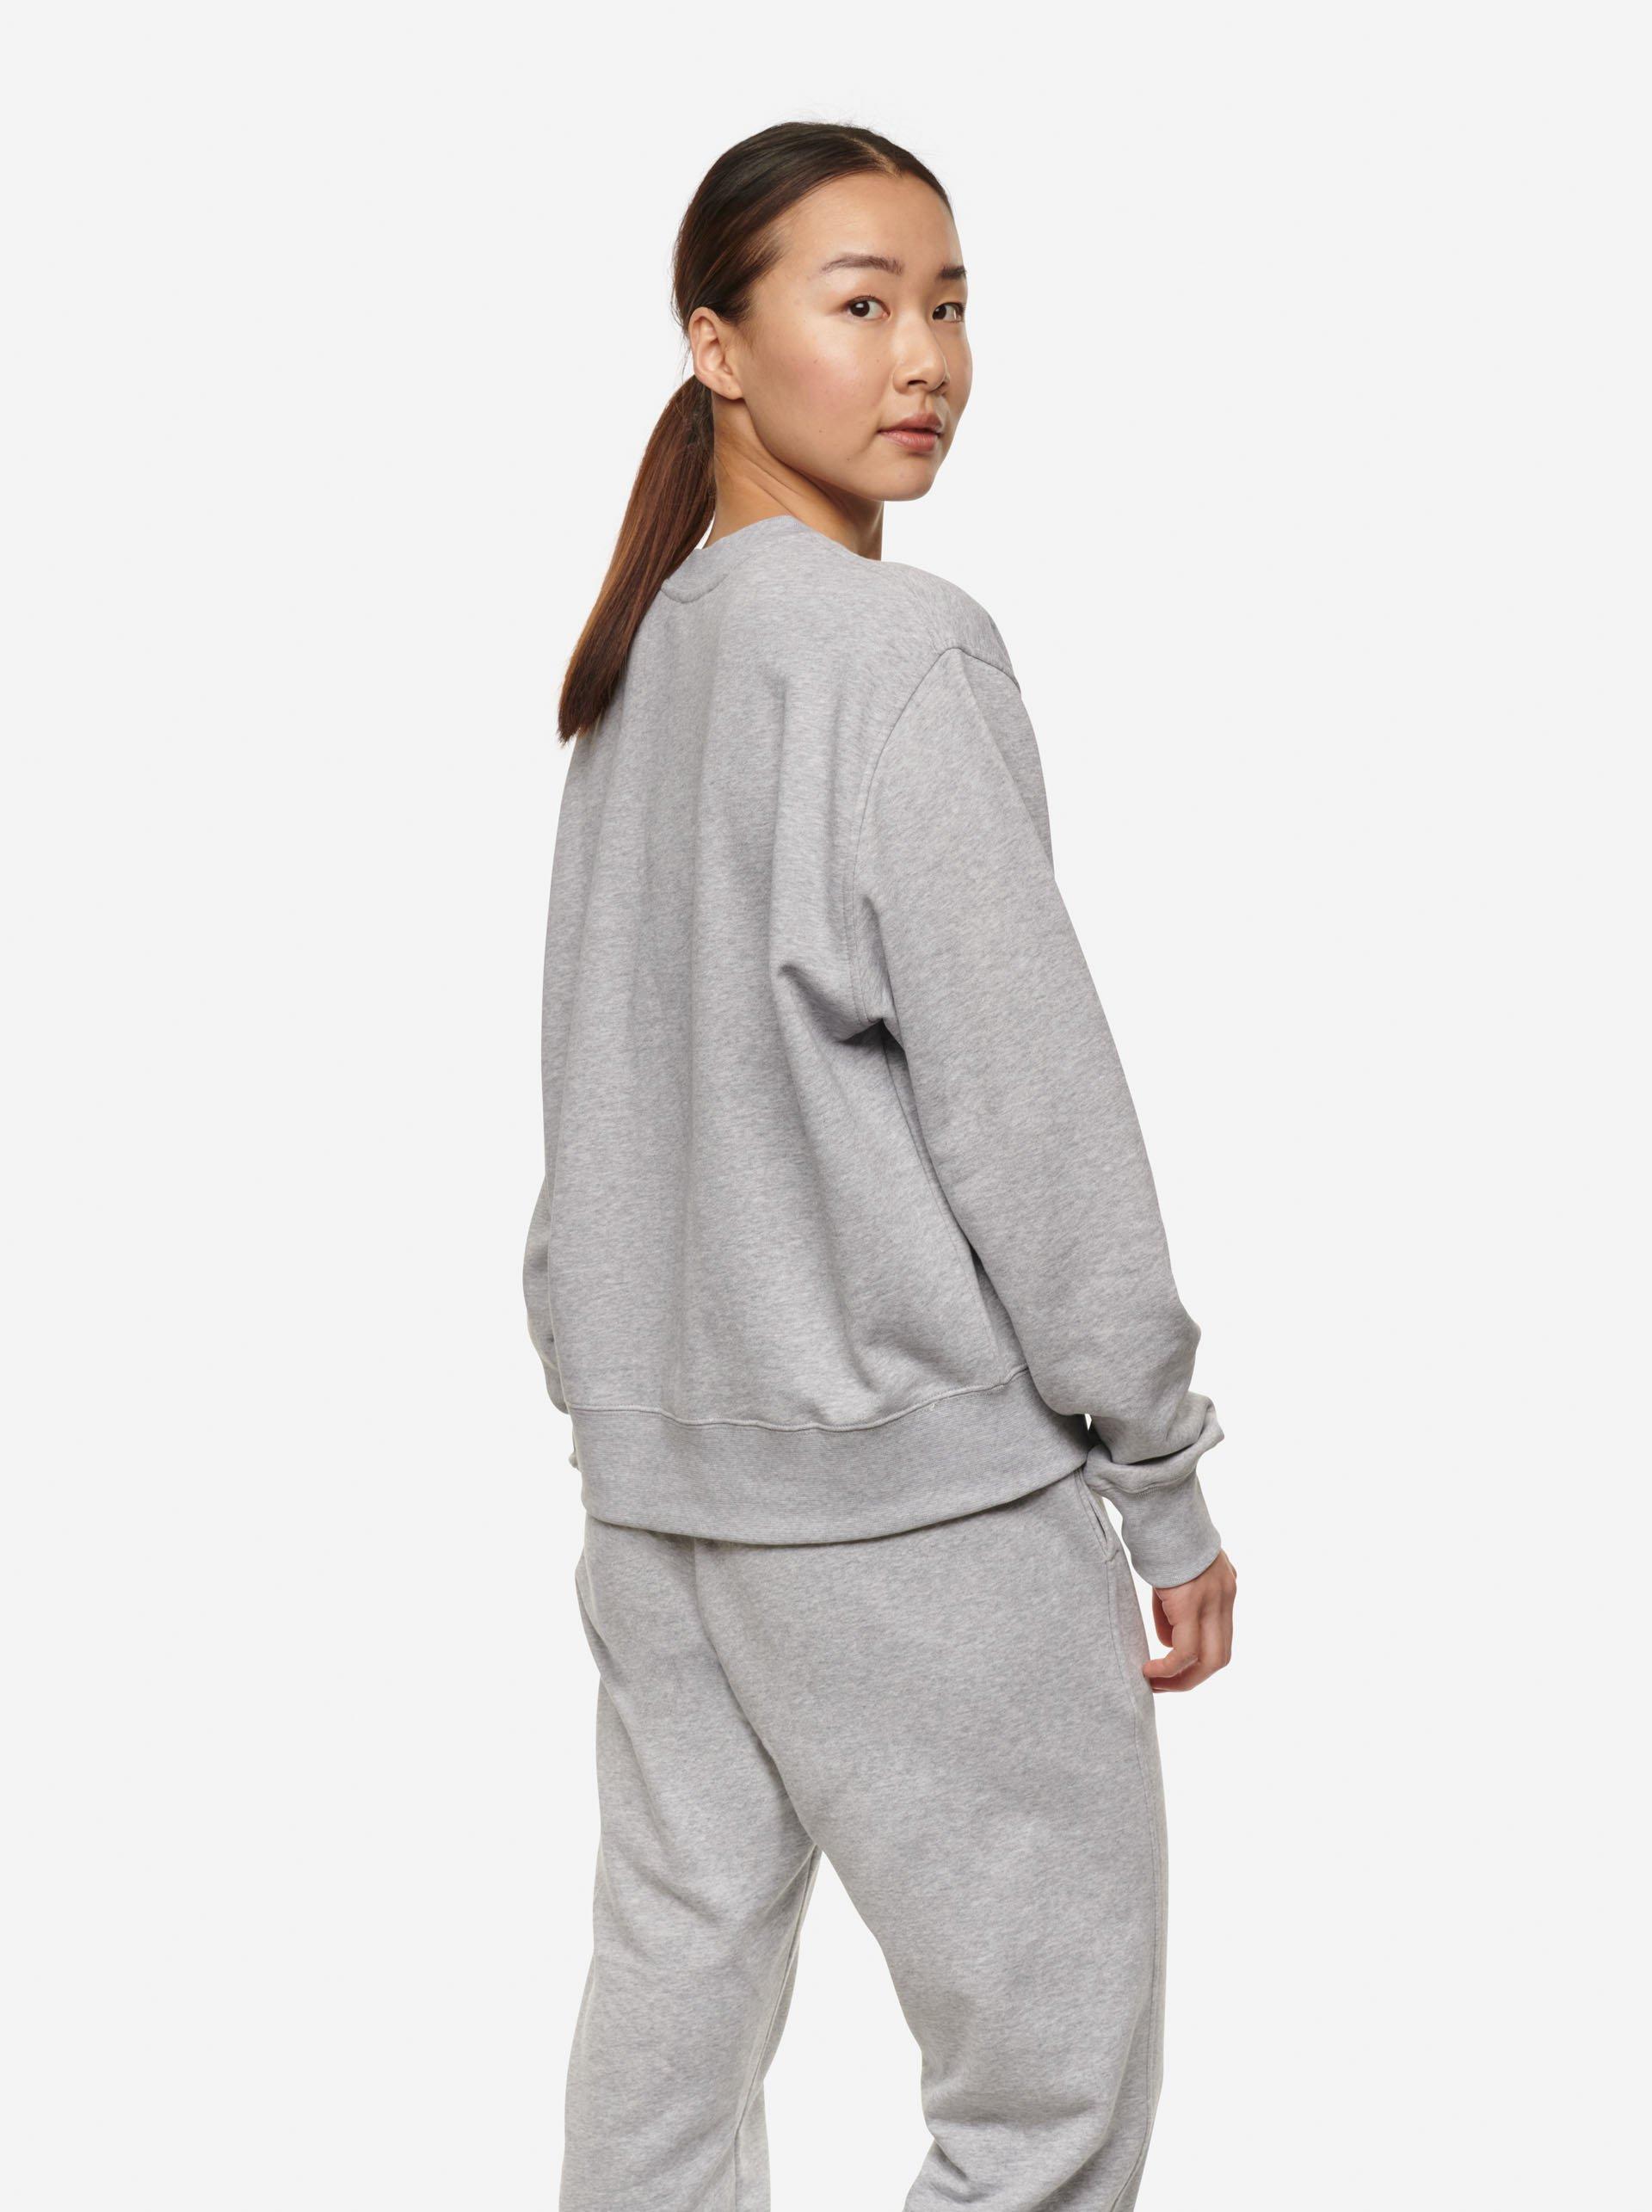 Teym-TheSweatshirt-Women-Grey05